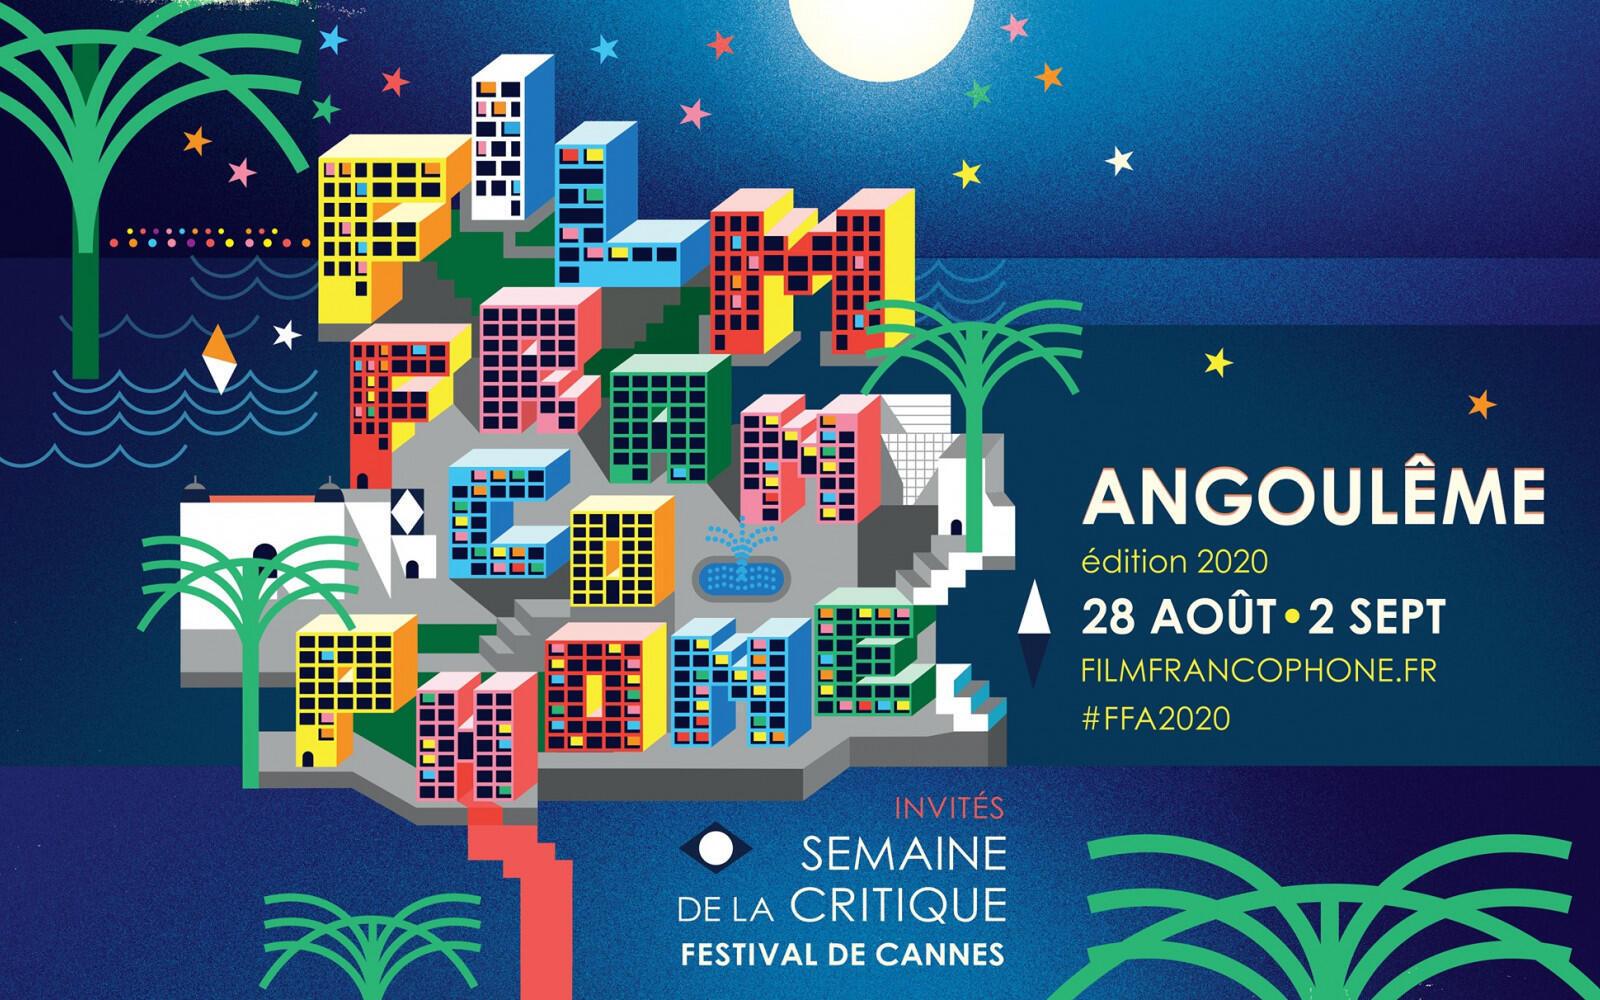 FILM FRANCOPHONE D'ANGOULÊME 2020